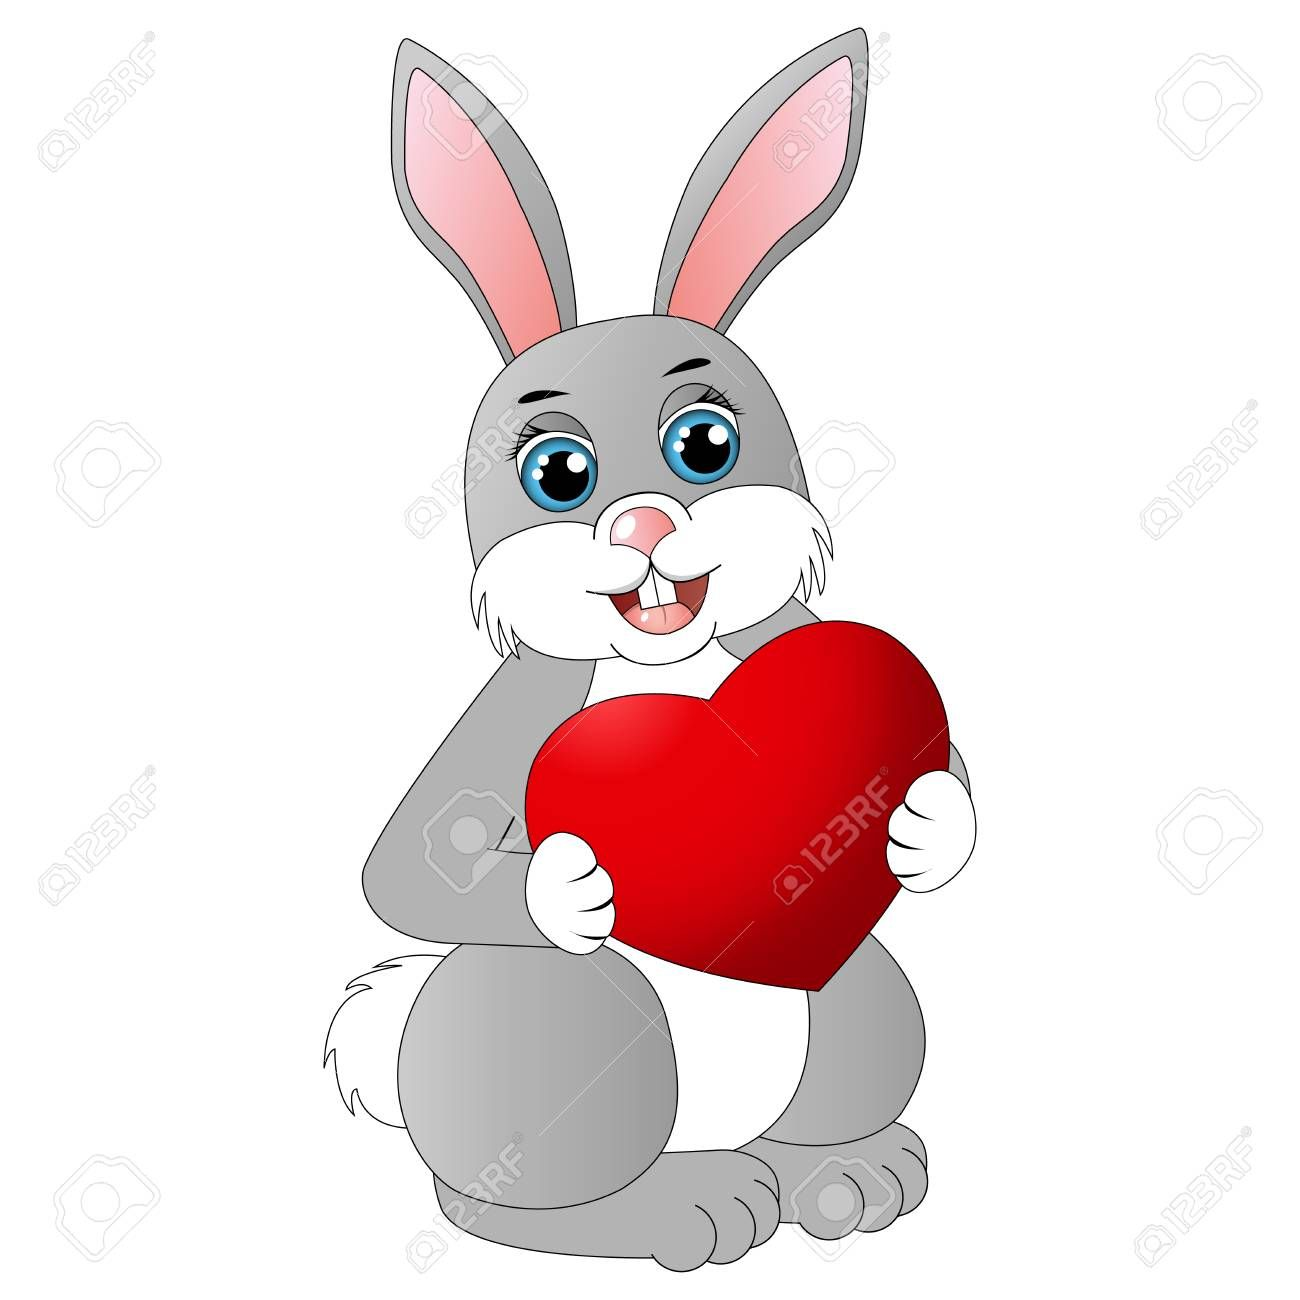 Cute Cartoon Rabbit Holding Heart Sponsored Cartoon Cute Rabbit Heart Holding In 2020 Rabbit Cartoon Cute Cartoon Cartoon